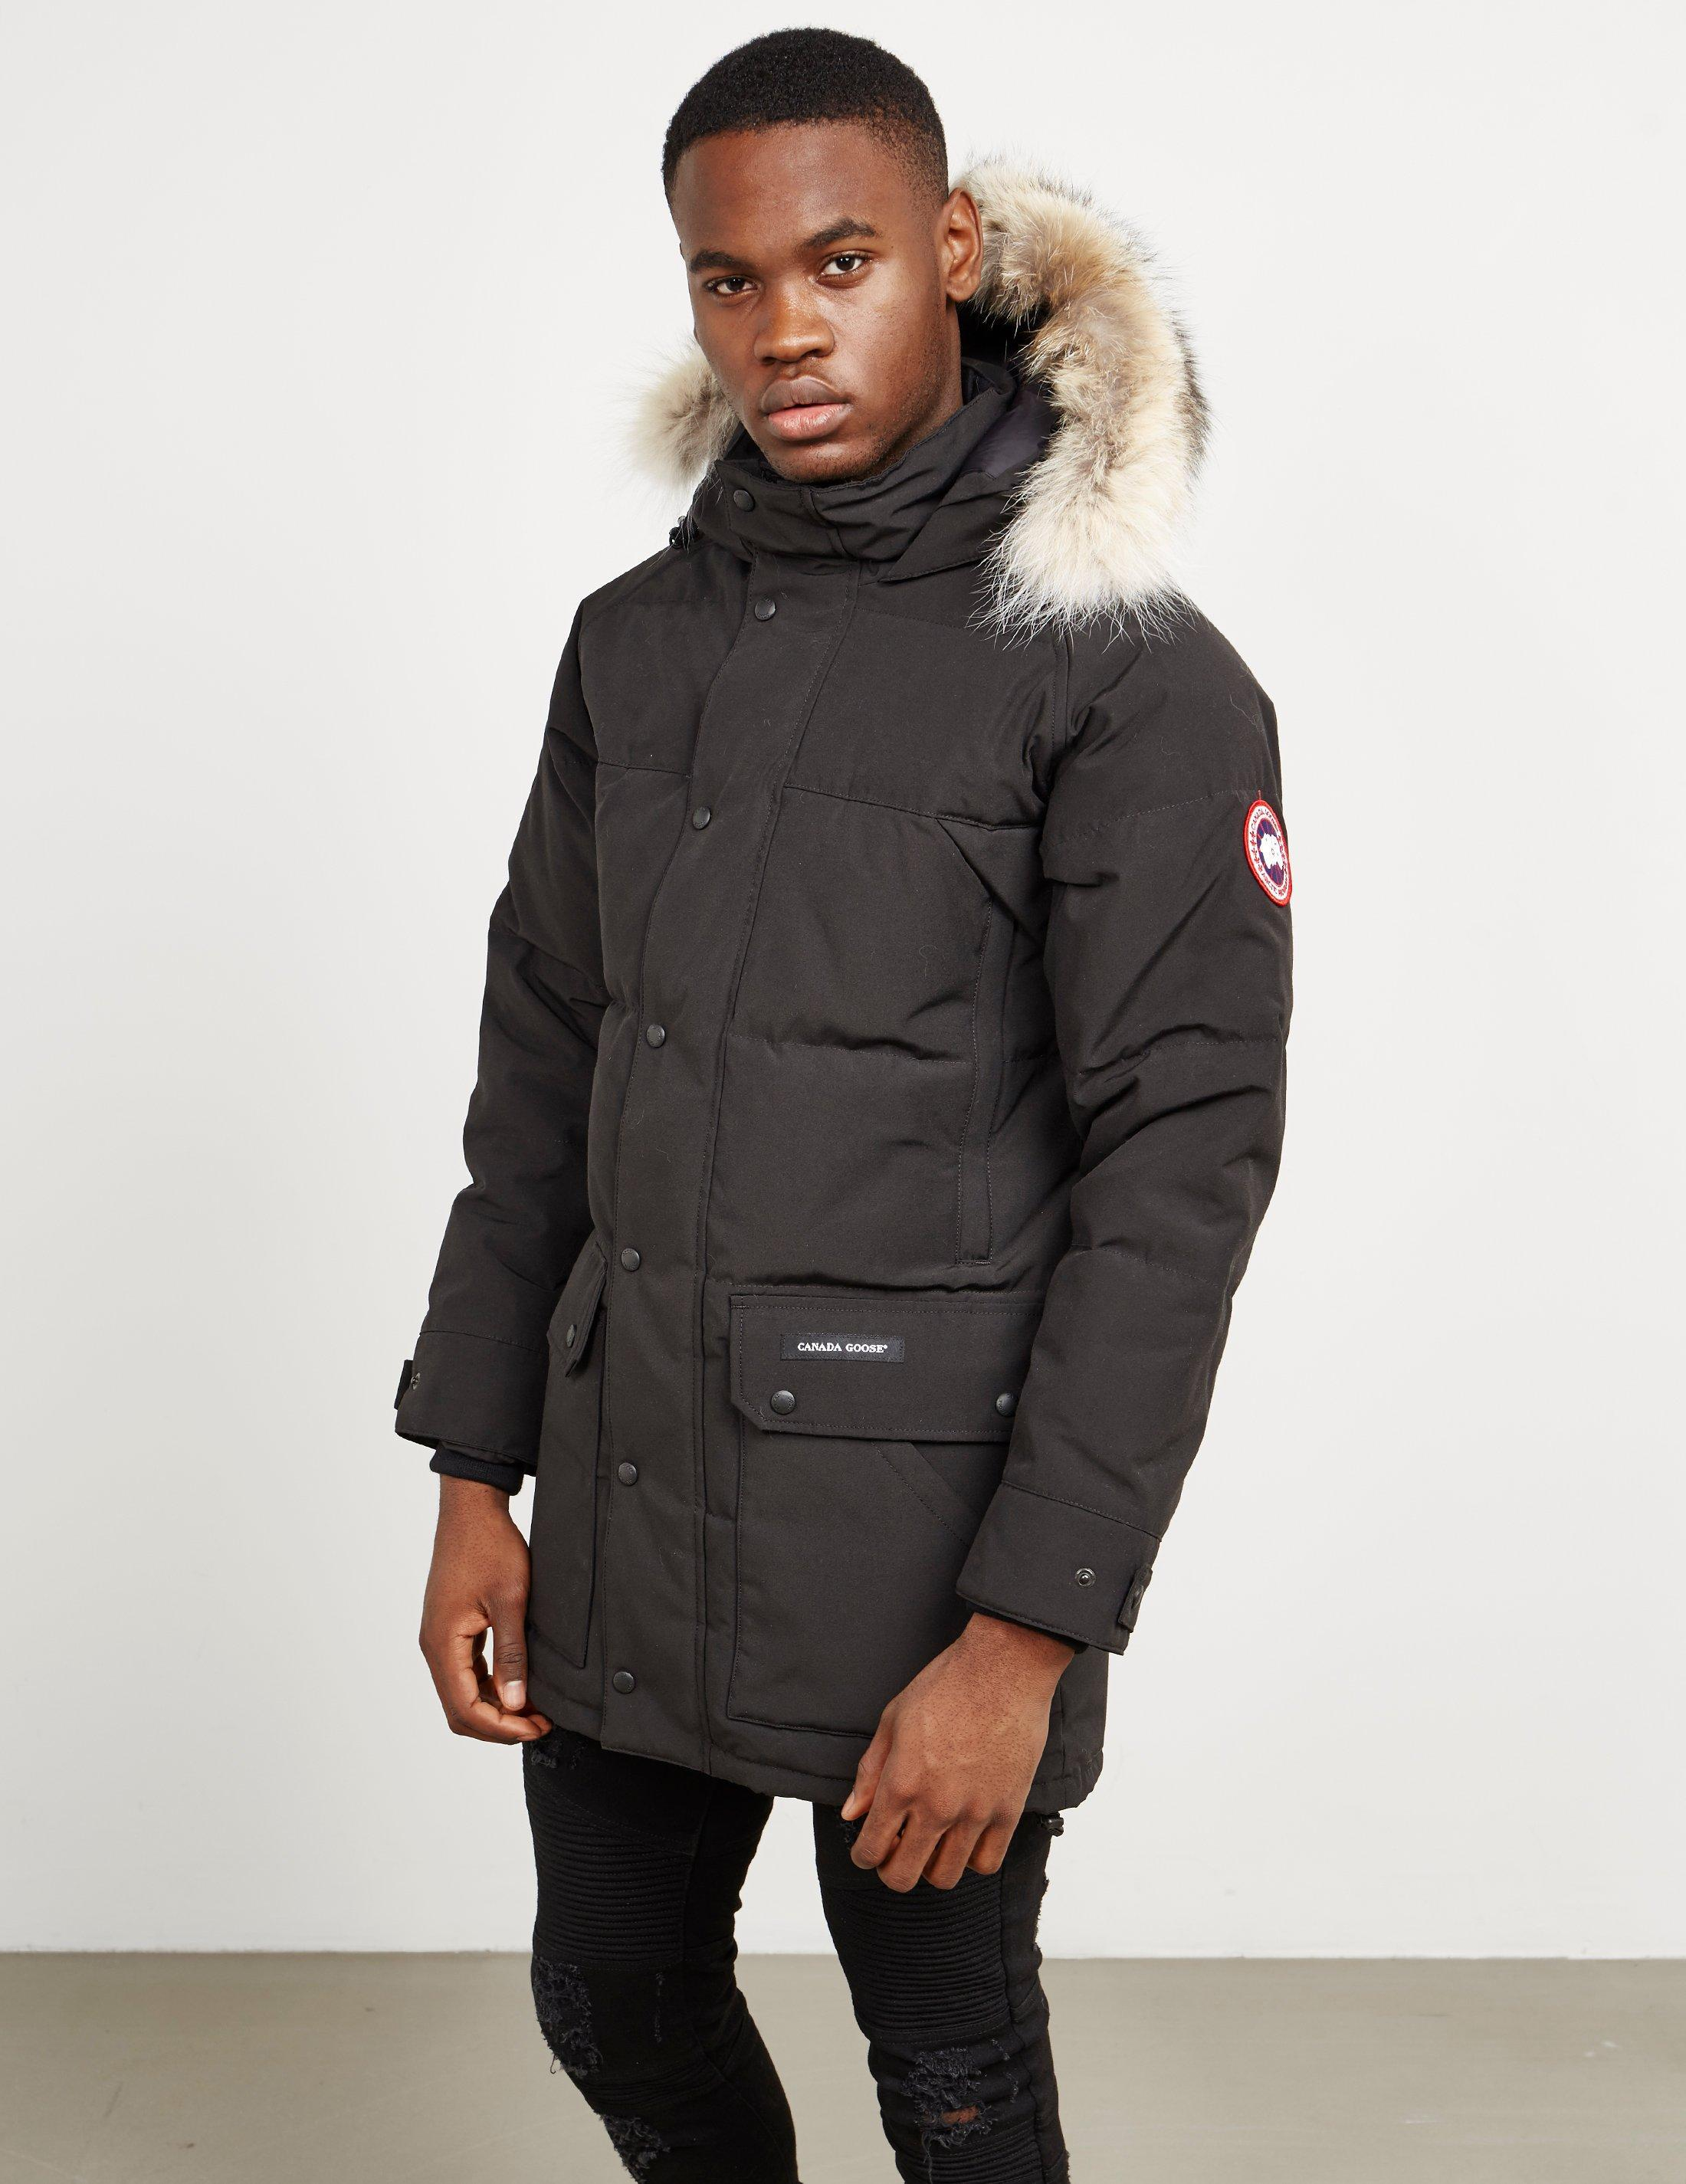 canada goose mens jacket harrods